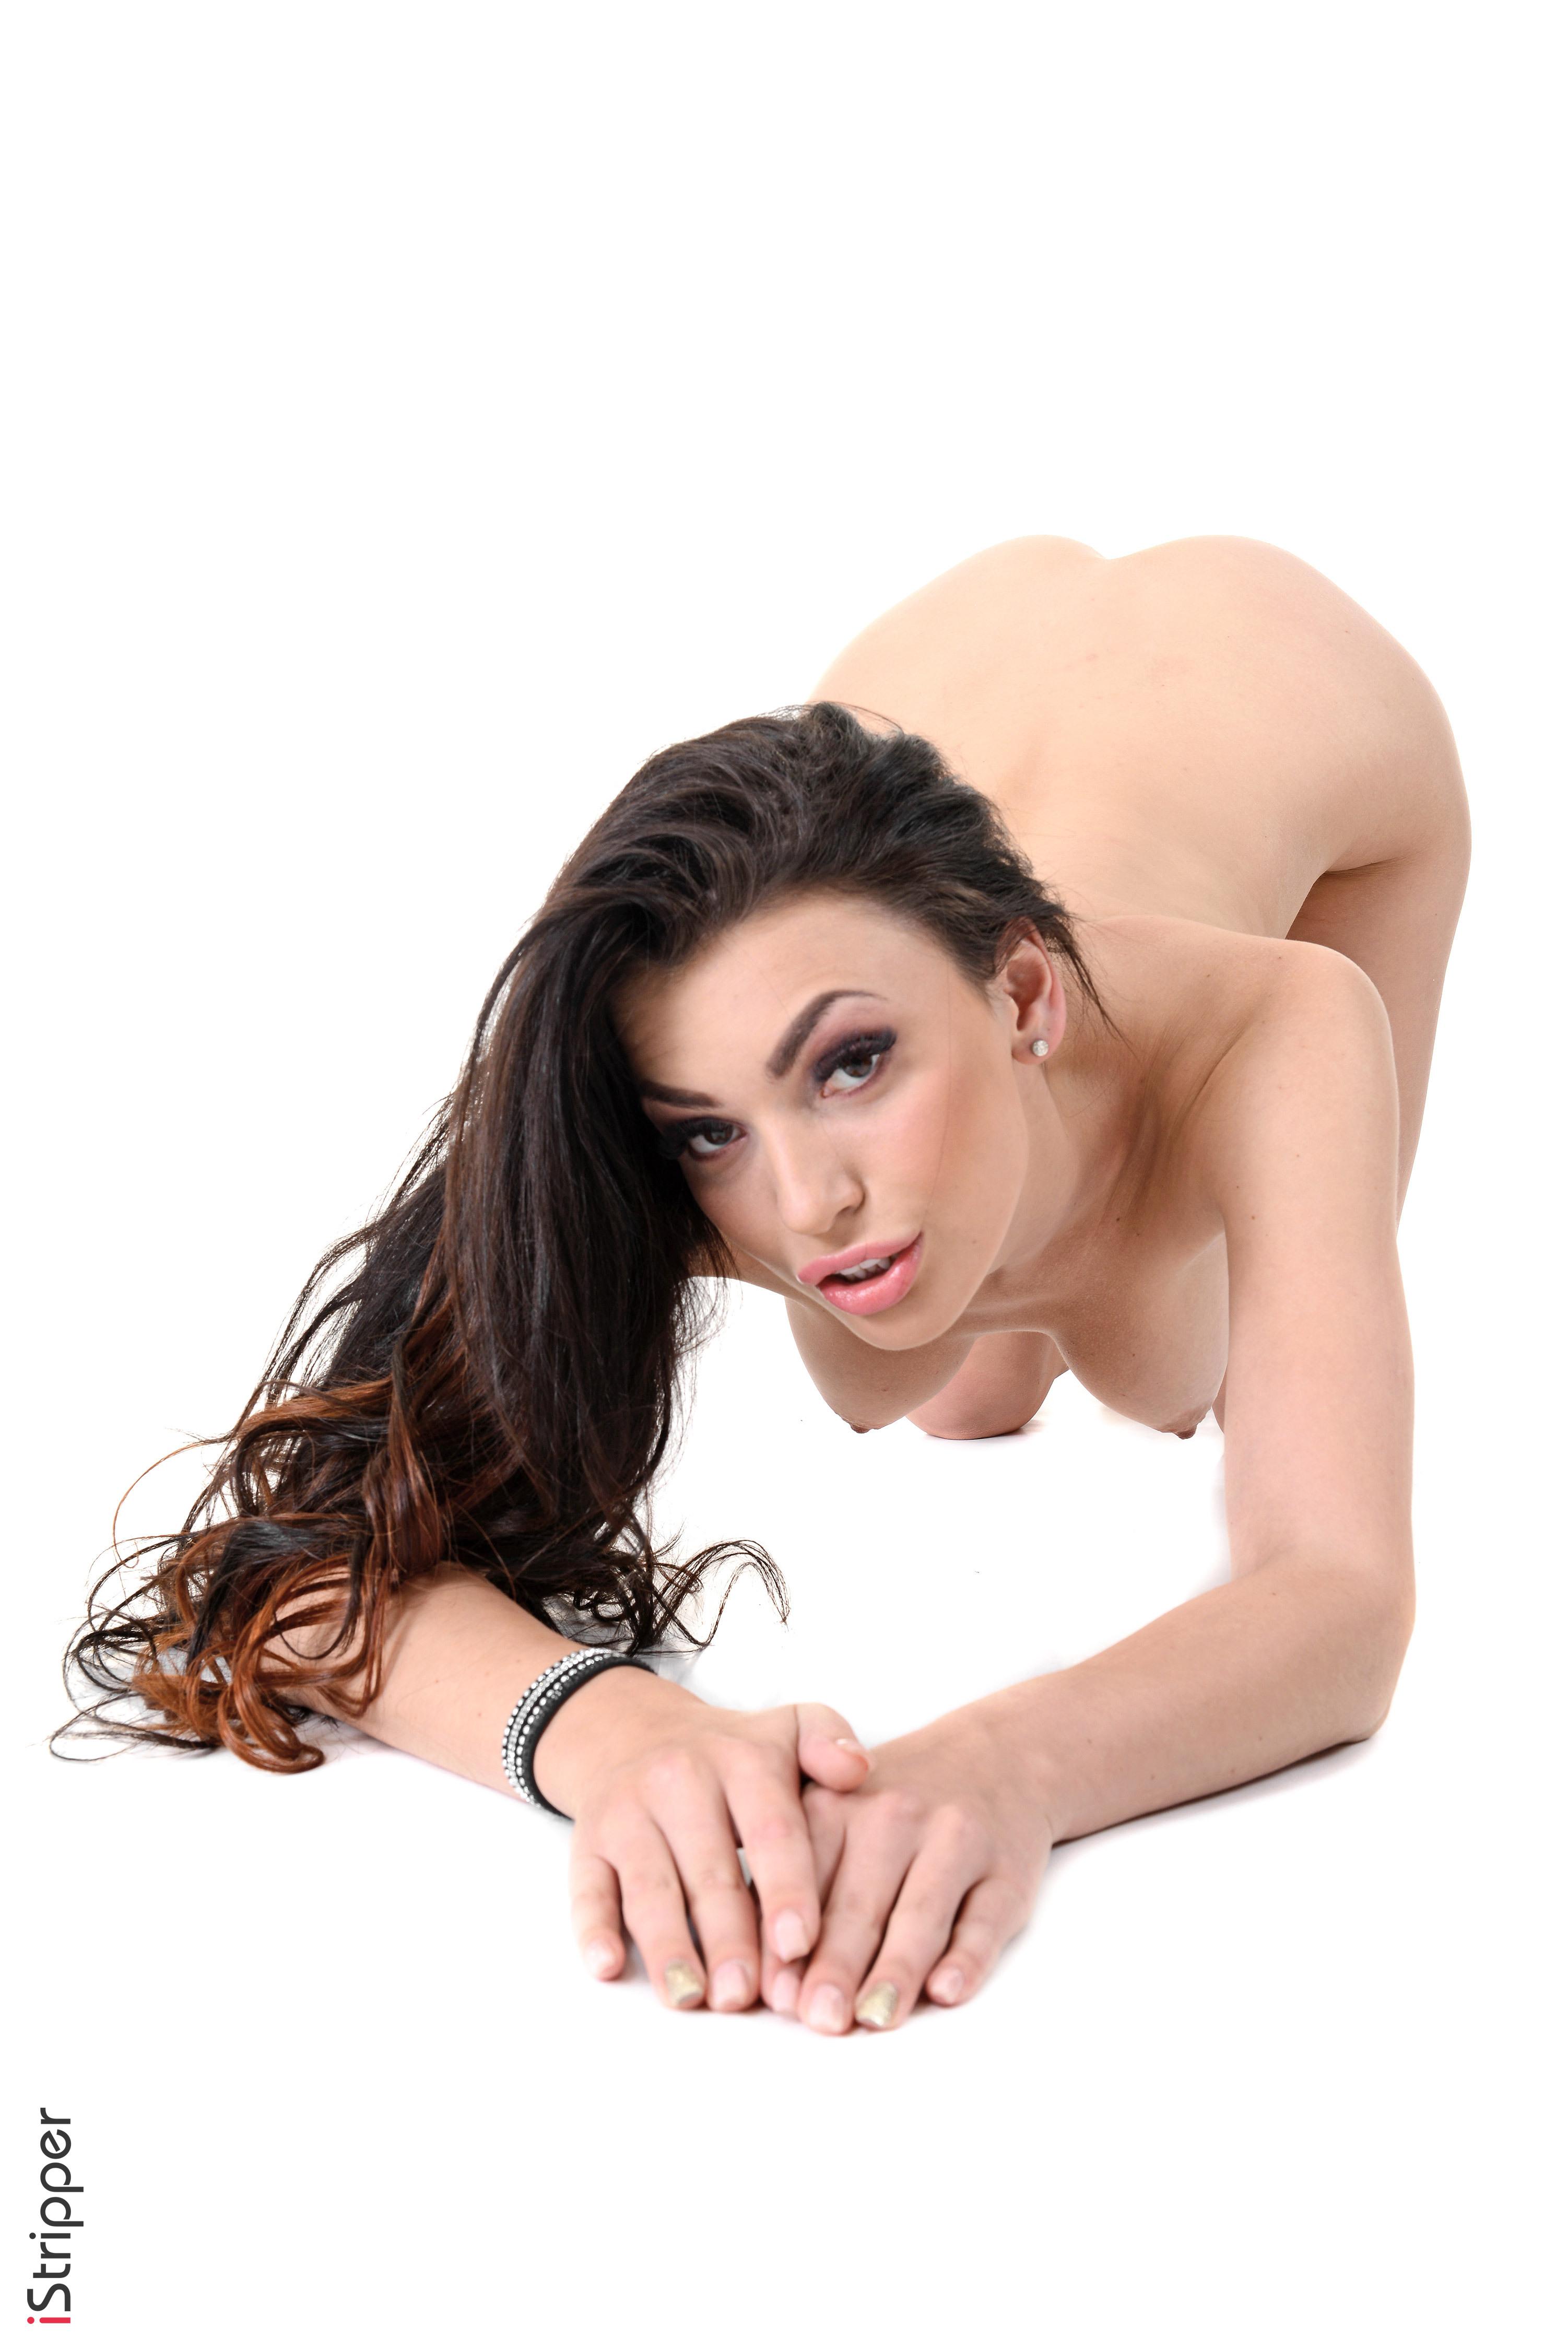 sexy nude women wallpaper